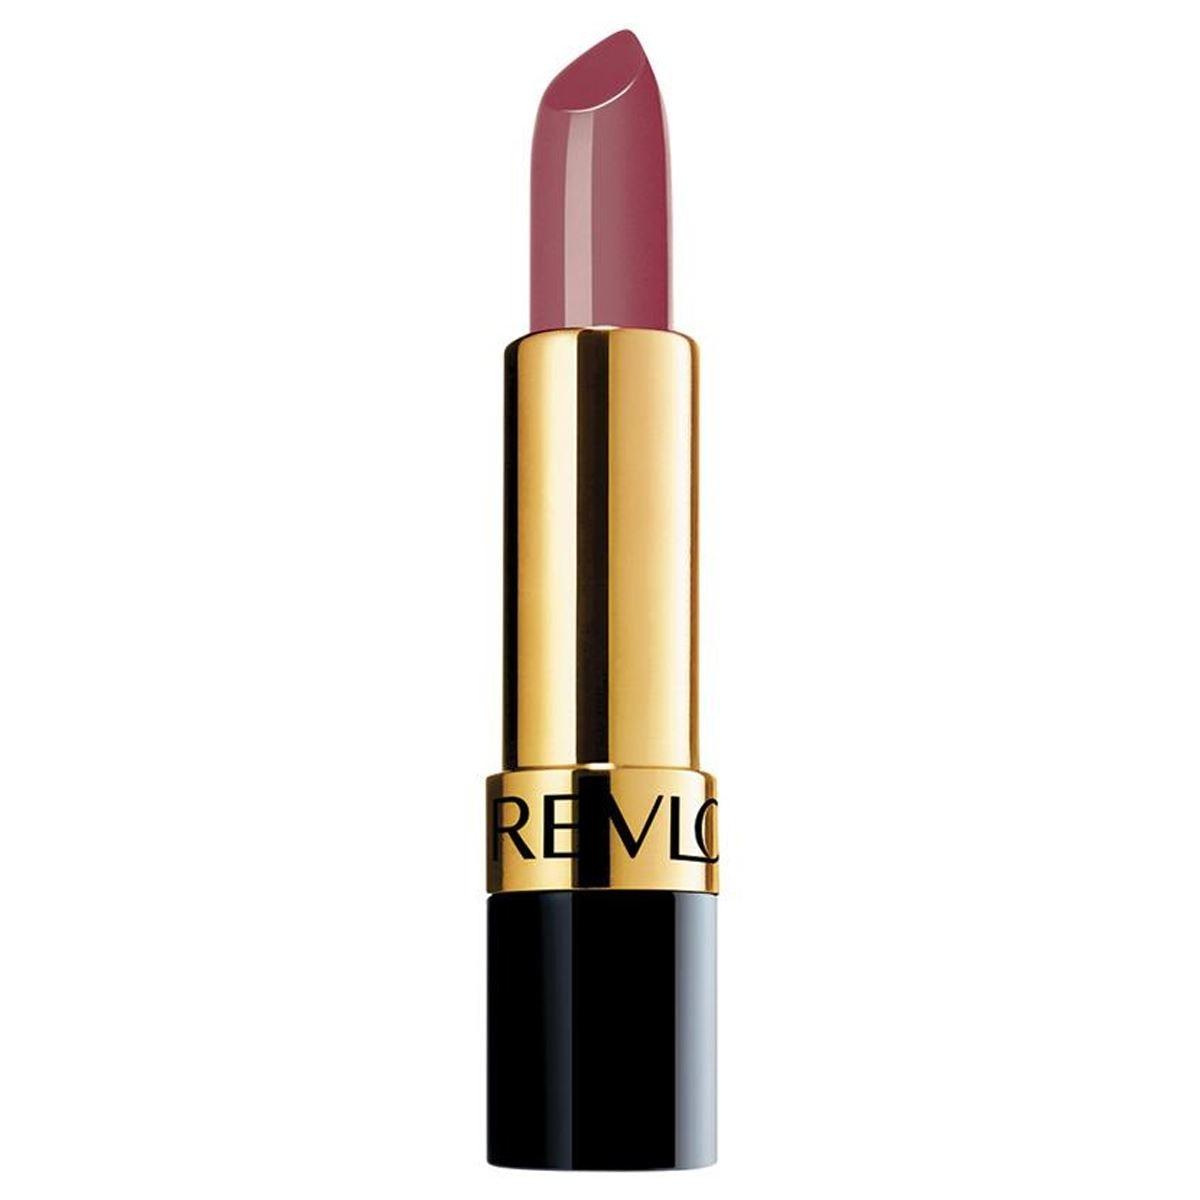 Superlustrous lipstick matte seductive sienna  - Sanborns